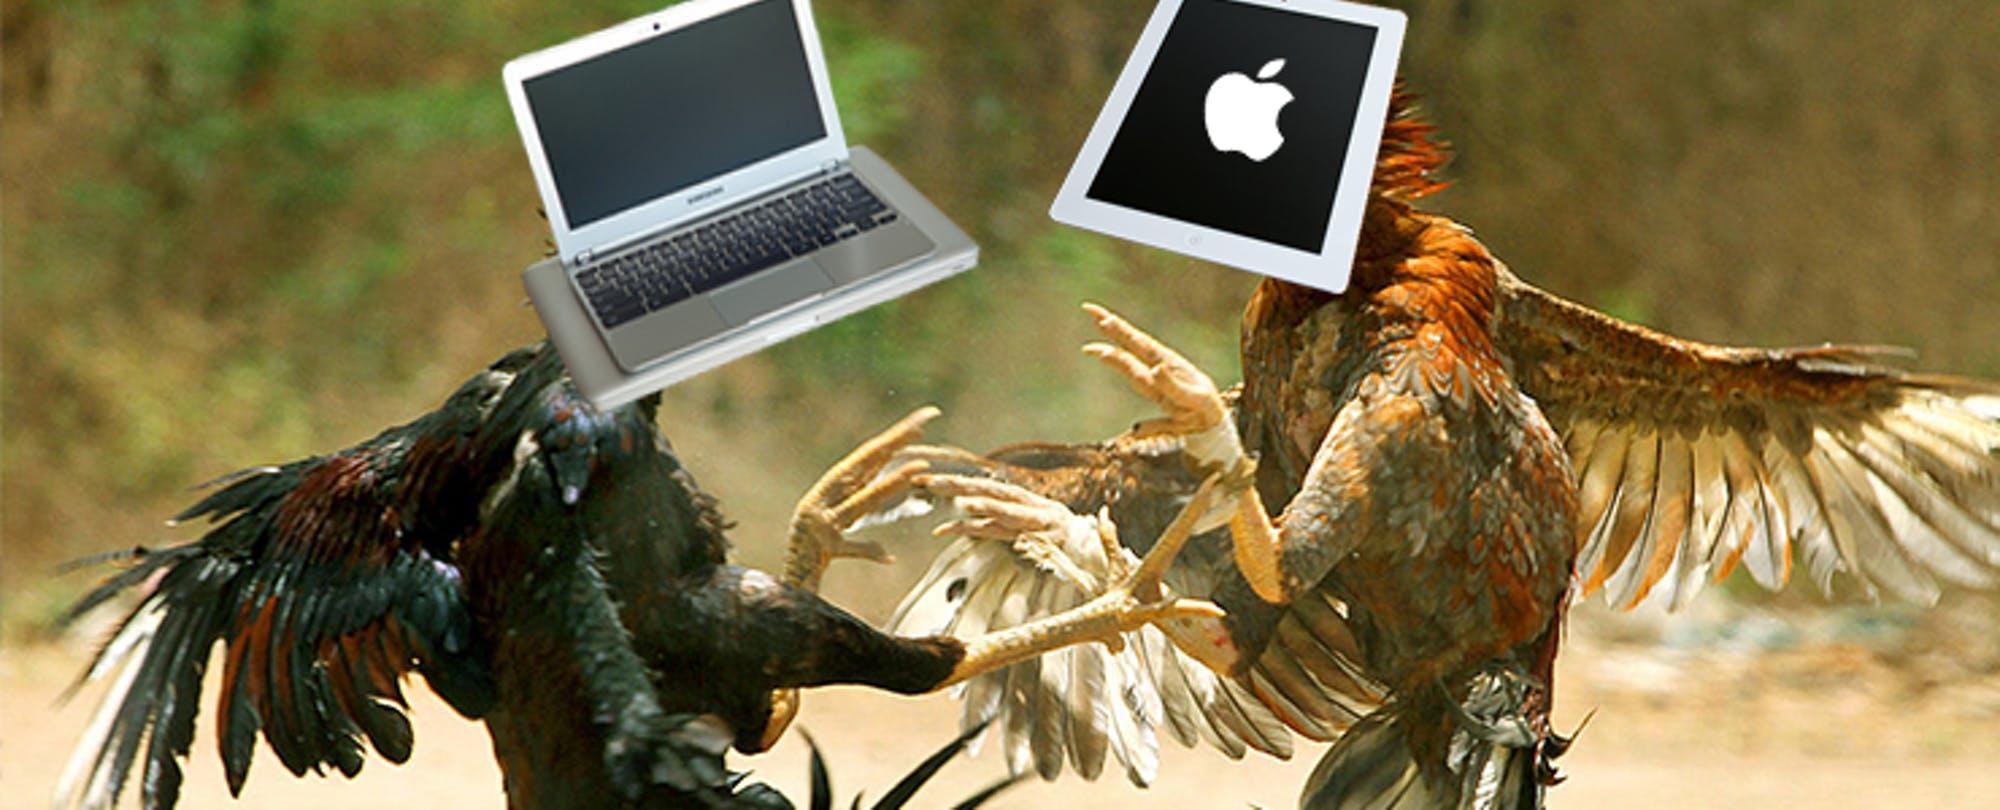 Why We Are Misunderstanding the Chromebook-iPad Debate